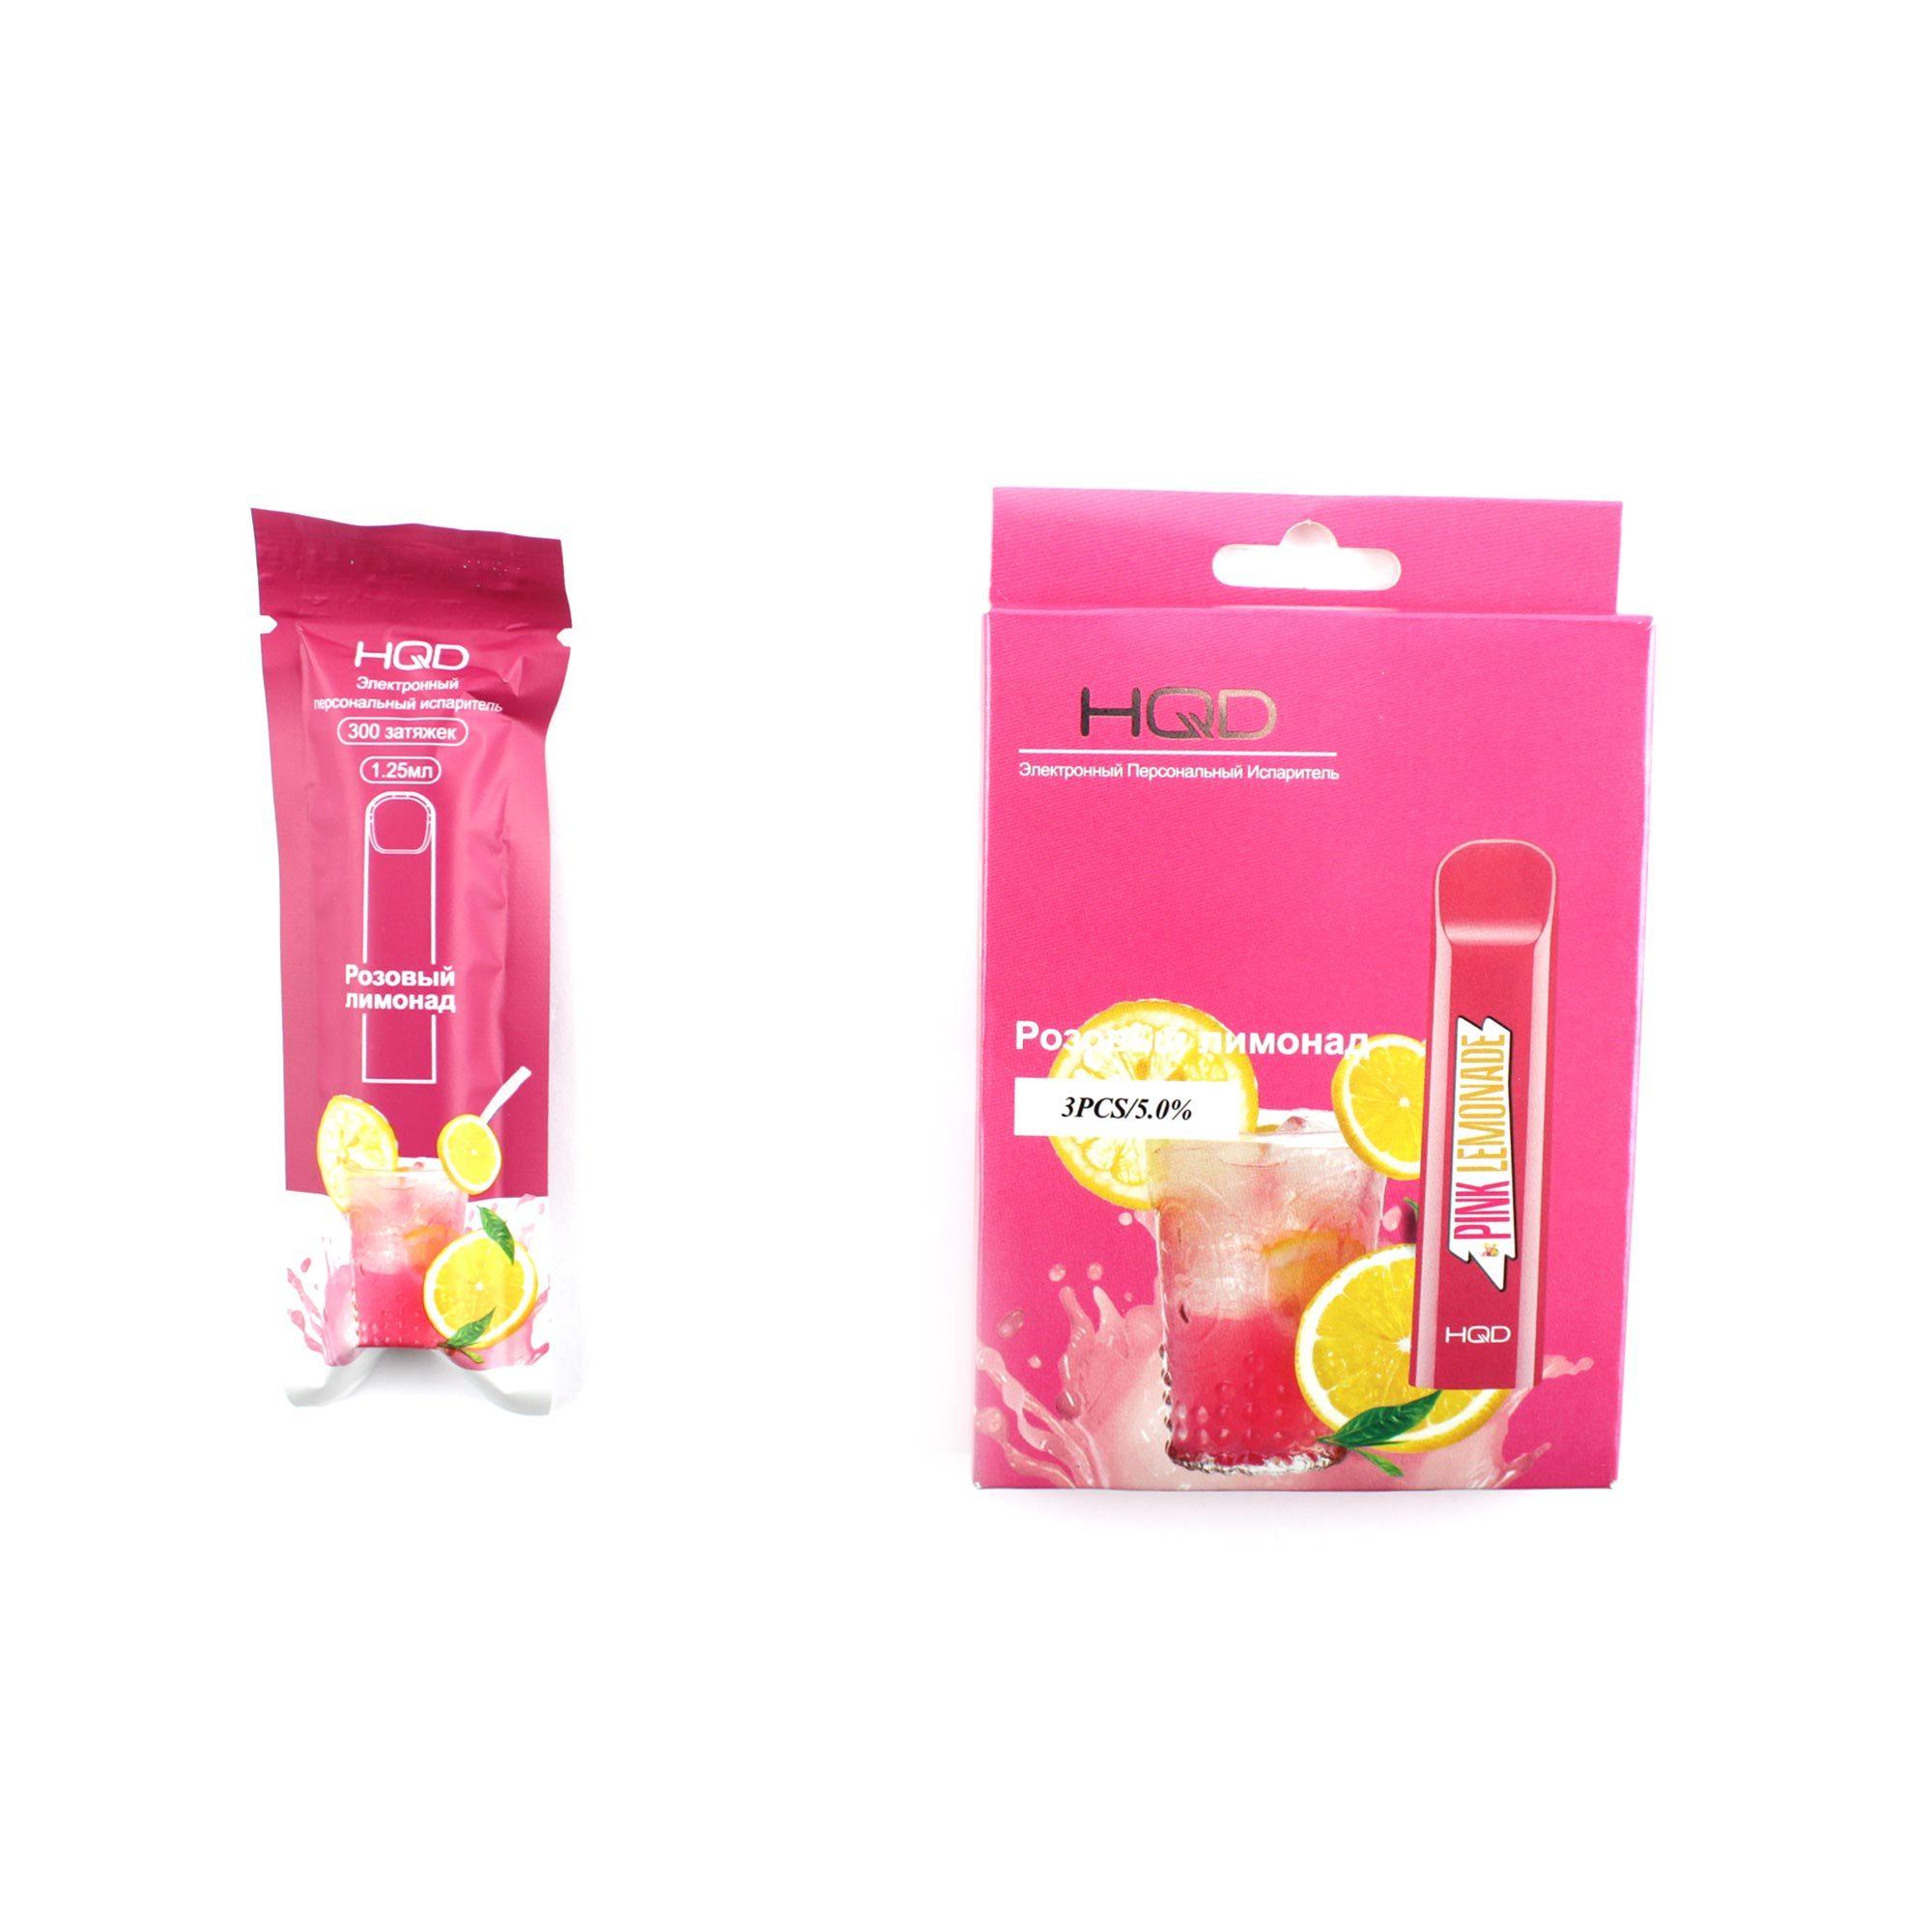 Одноразовая электронная сигарета HQD Pink Lemonad (Розовый Лимонад)